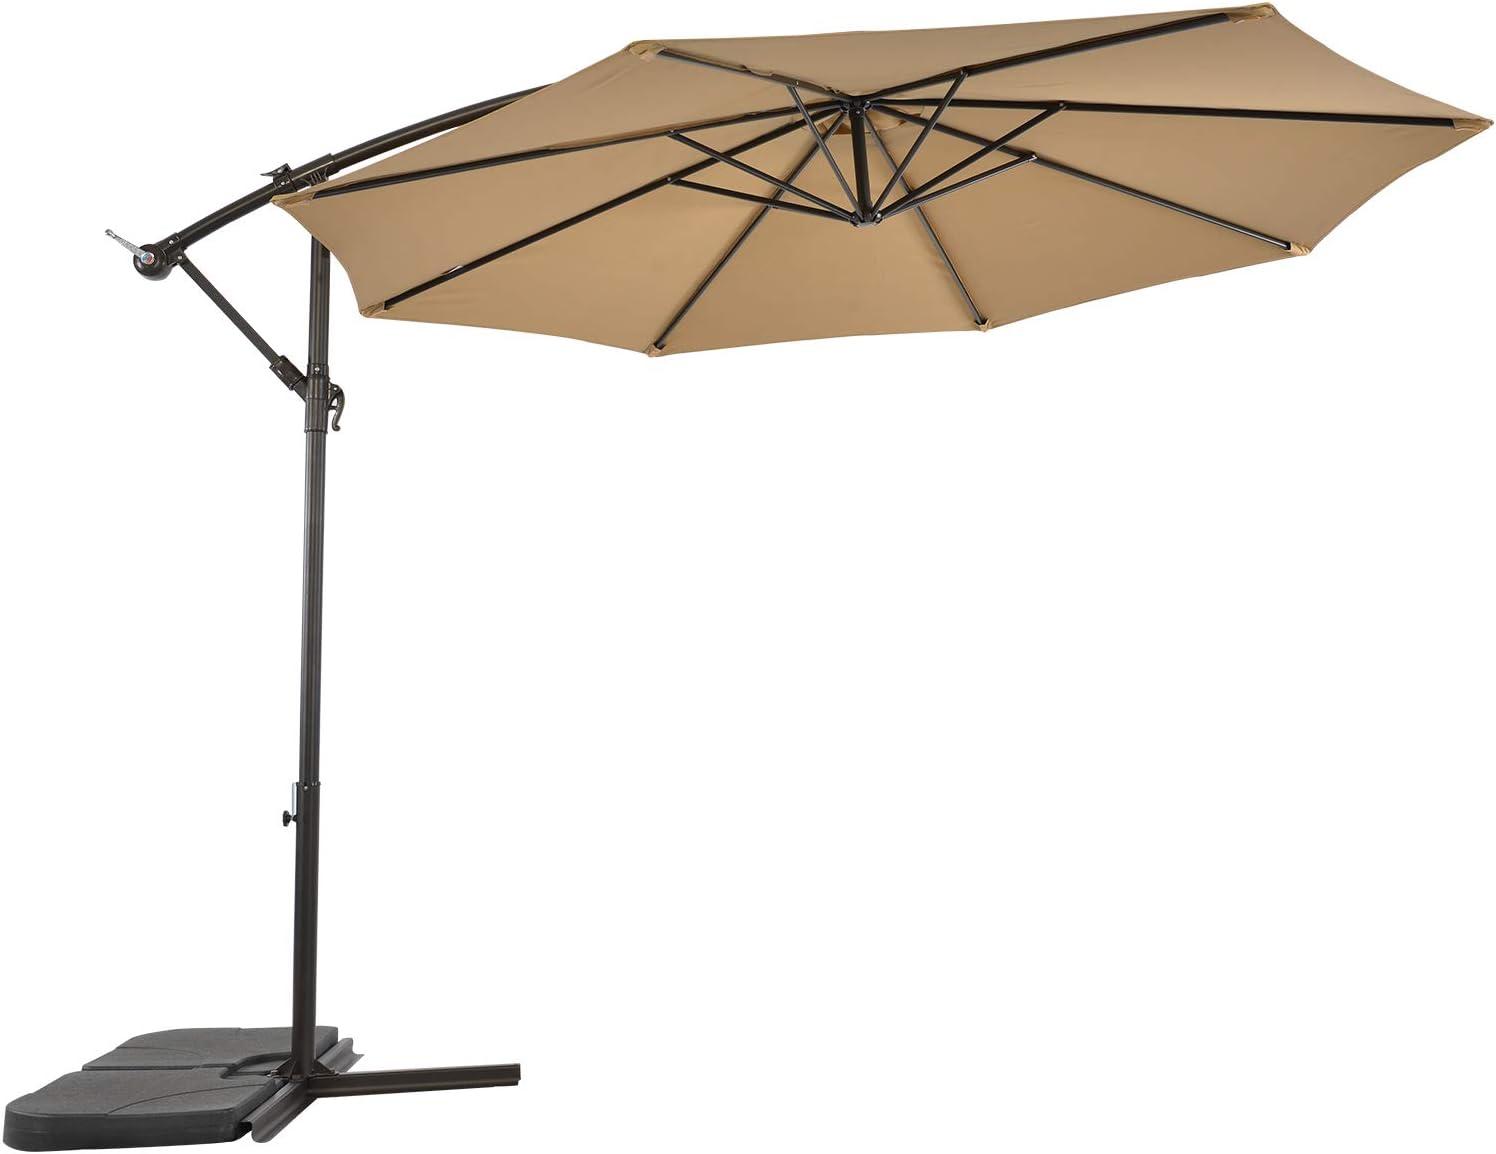 LCH 10 Feet Patio Umbrella Offset Cantilever Hanging Tilt Outdoor Umbrella, Beige